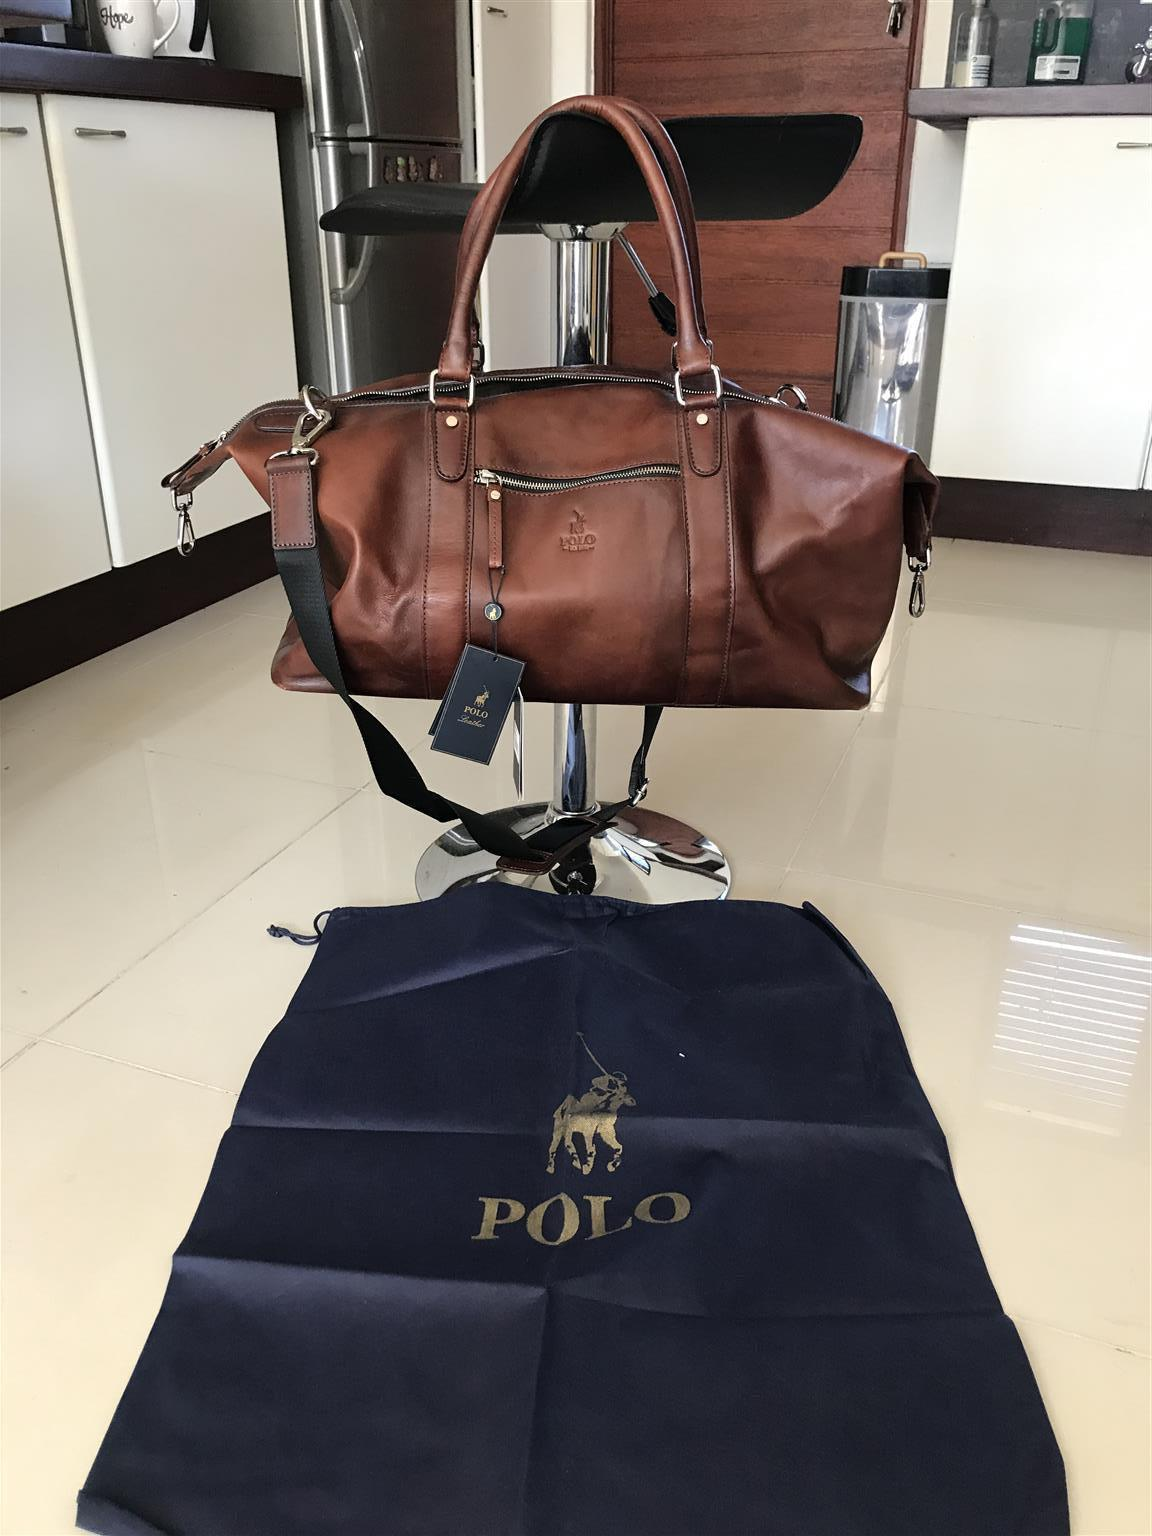 Polo Leather Duffel Bag